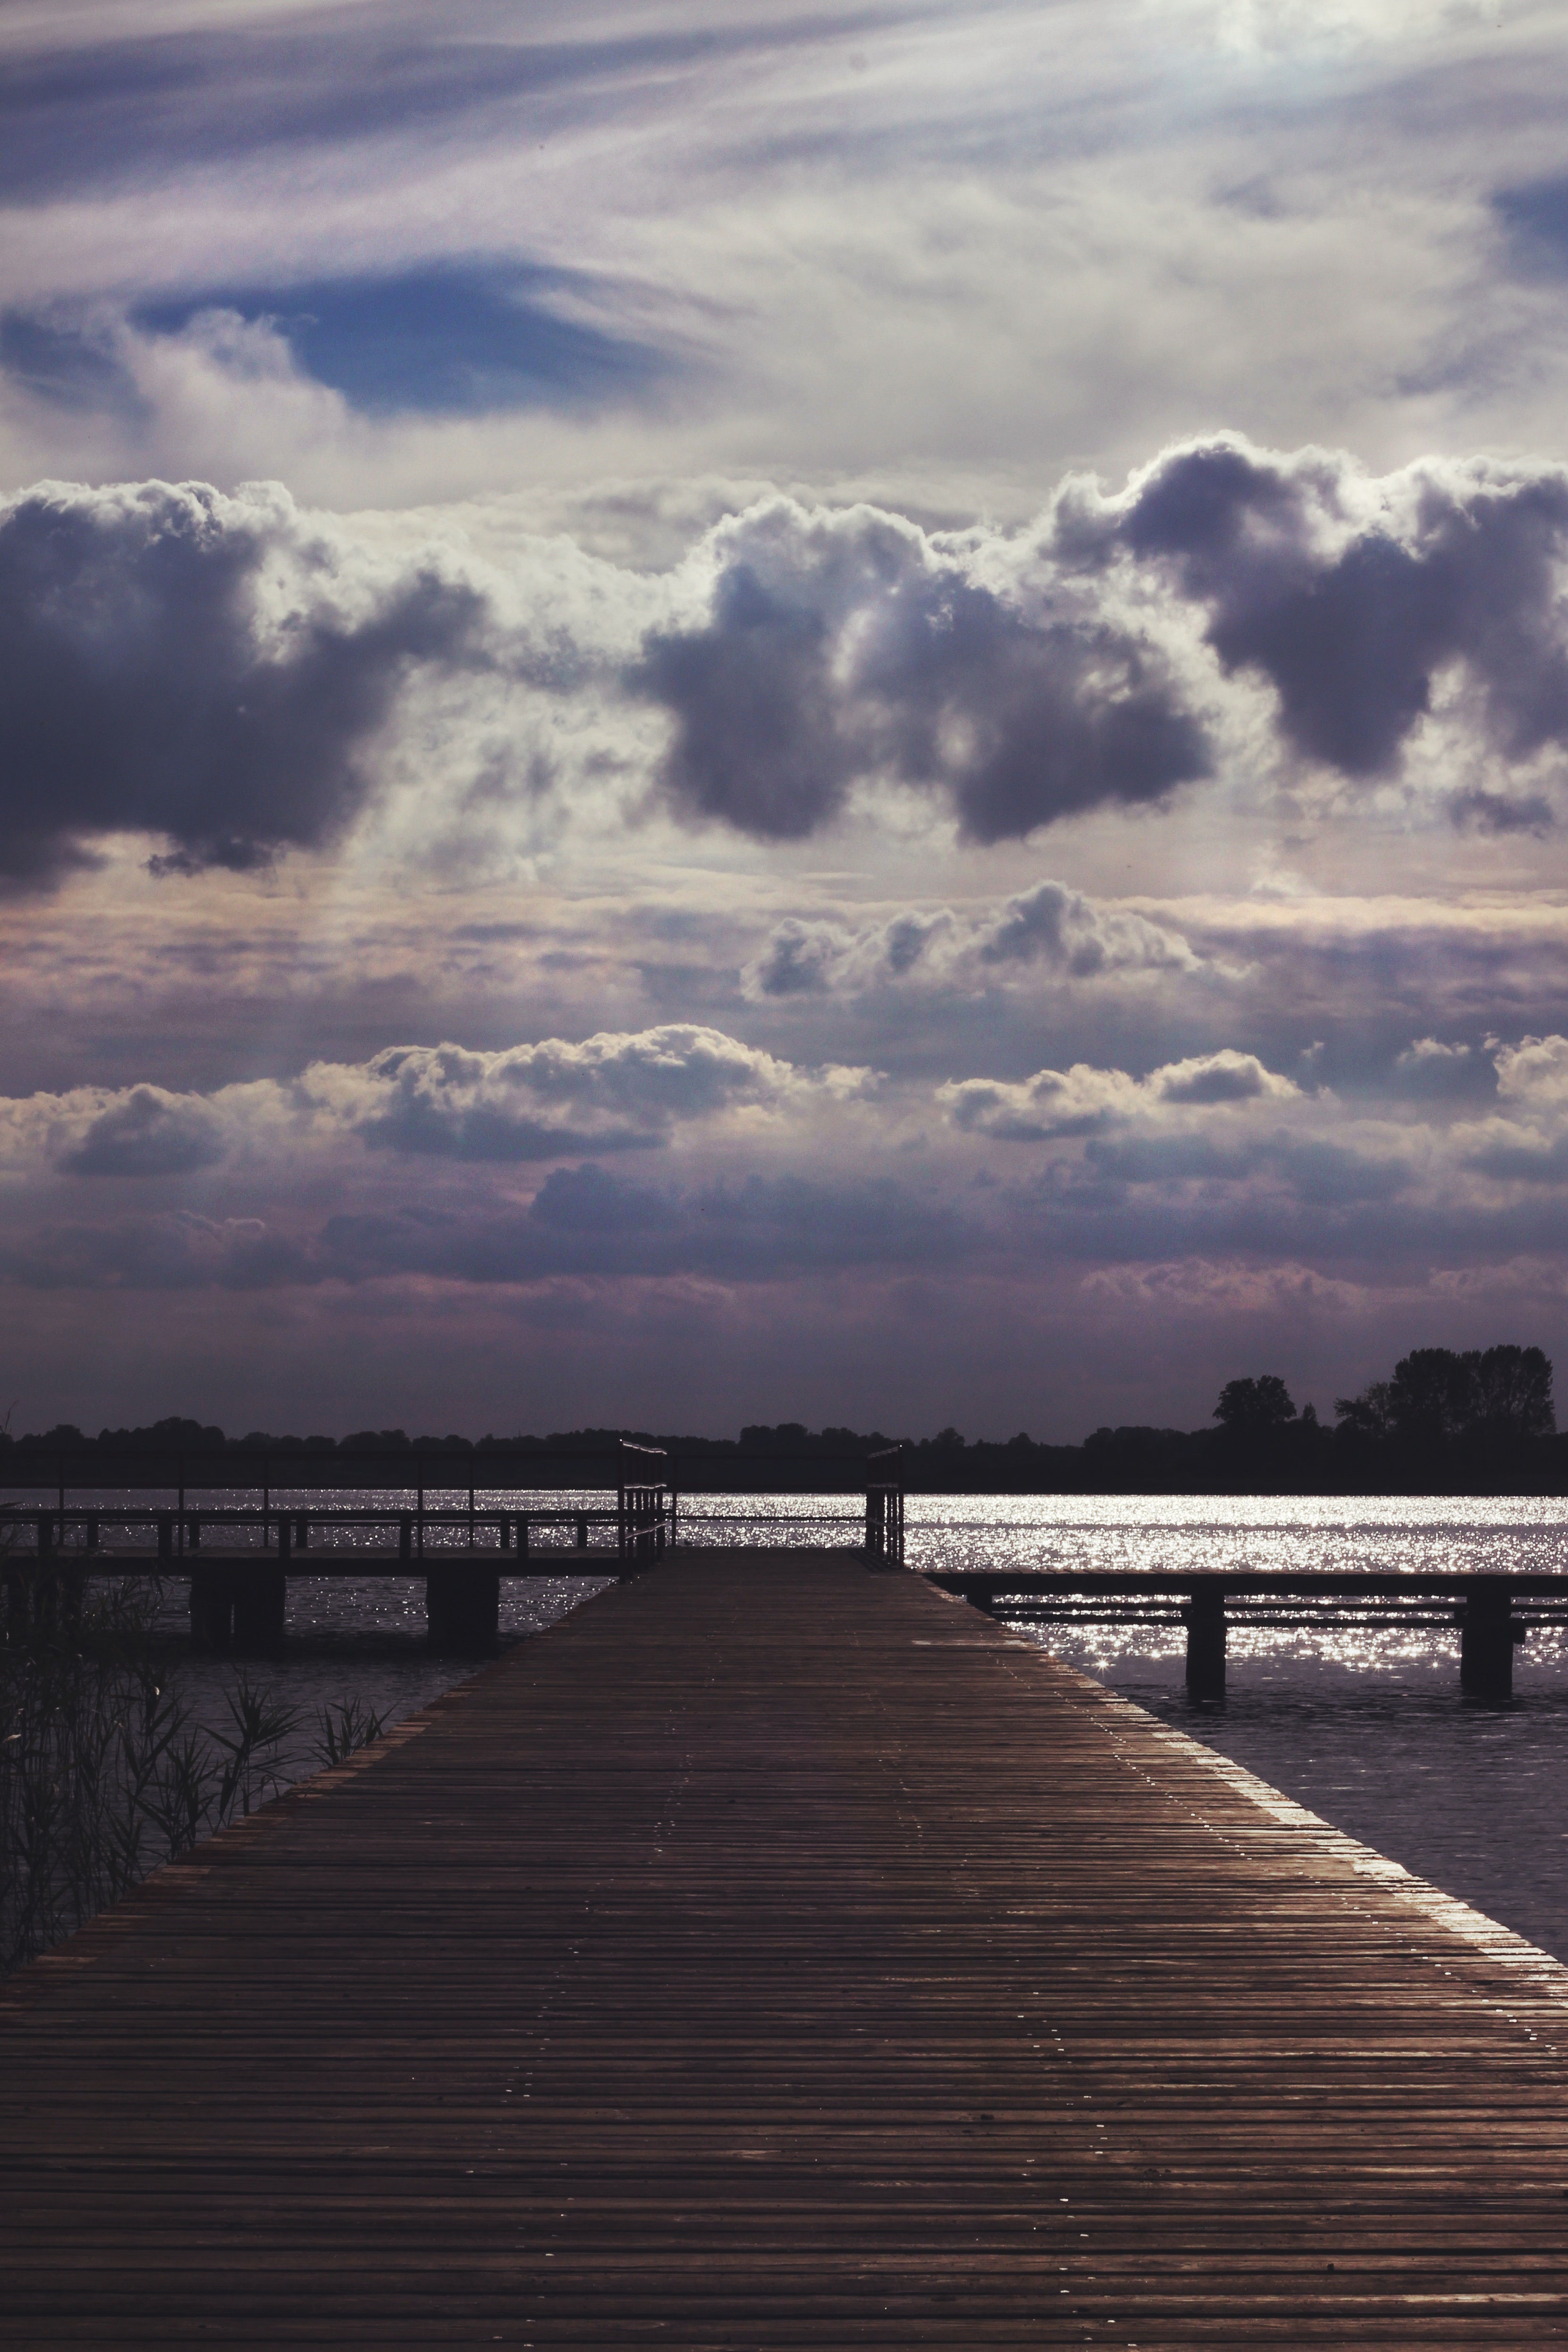 Lake & sky, Beach, Wood planks, Water, Travel, HQ Photo